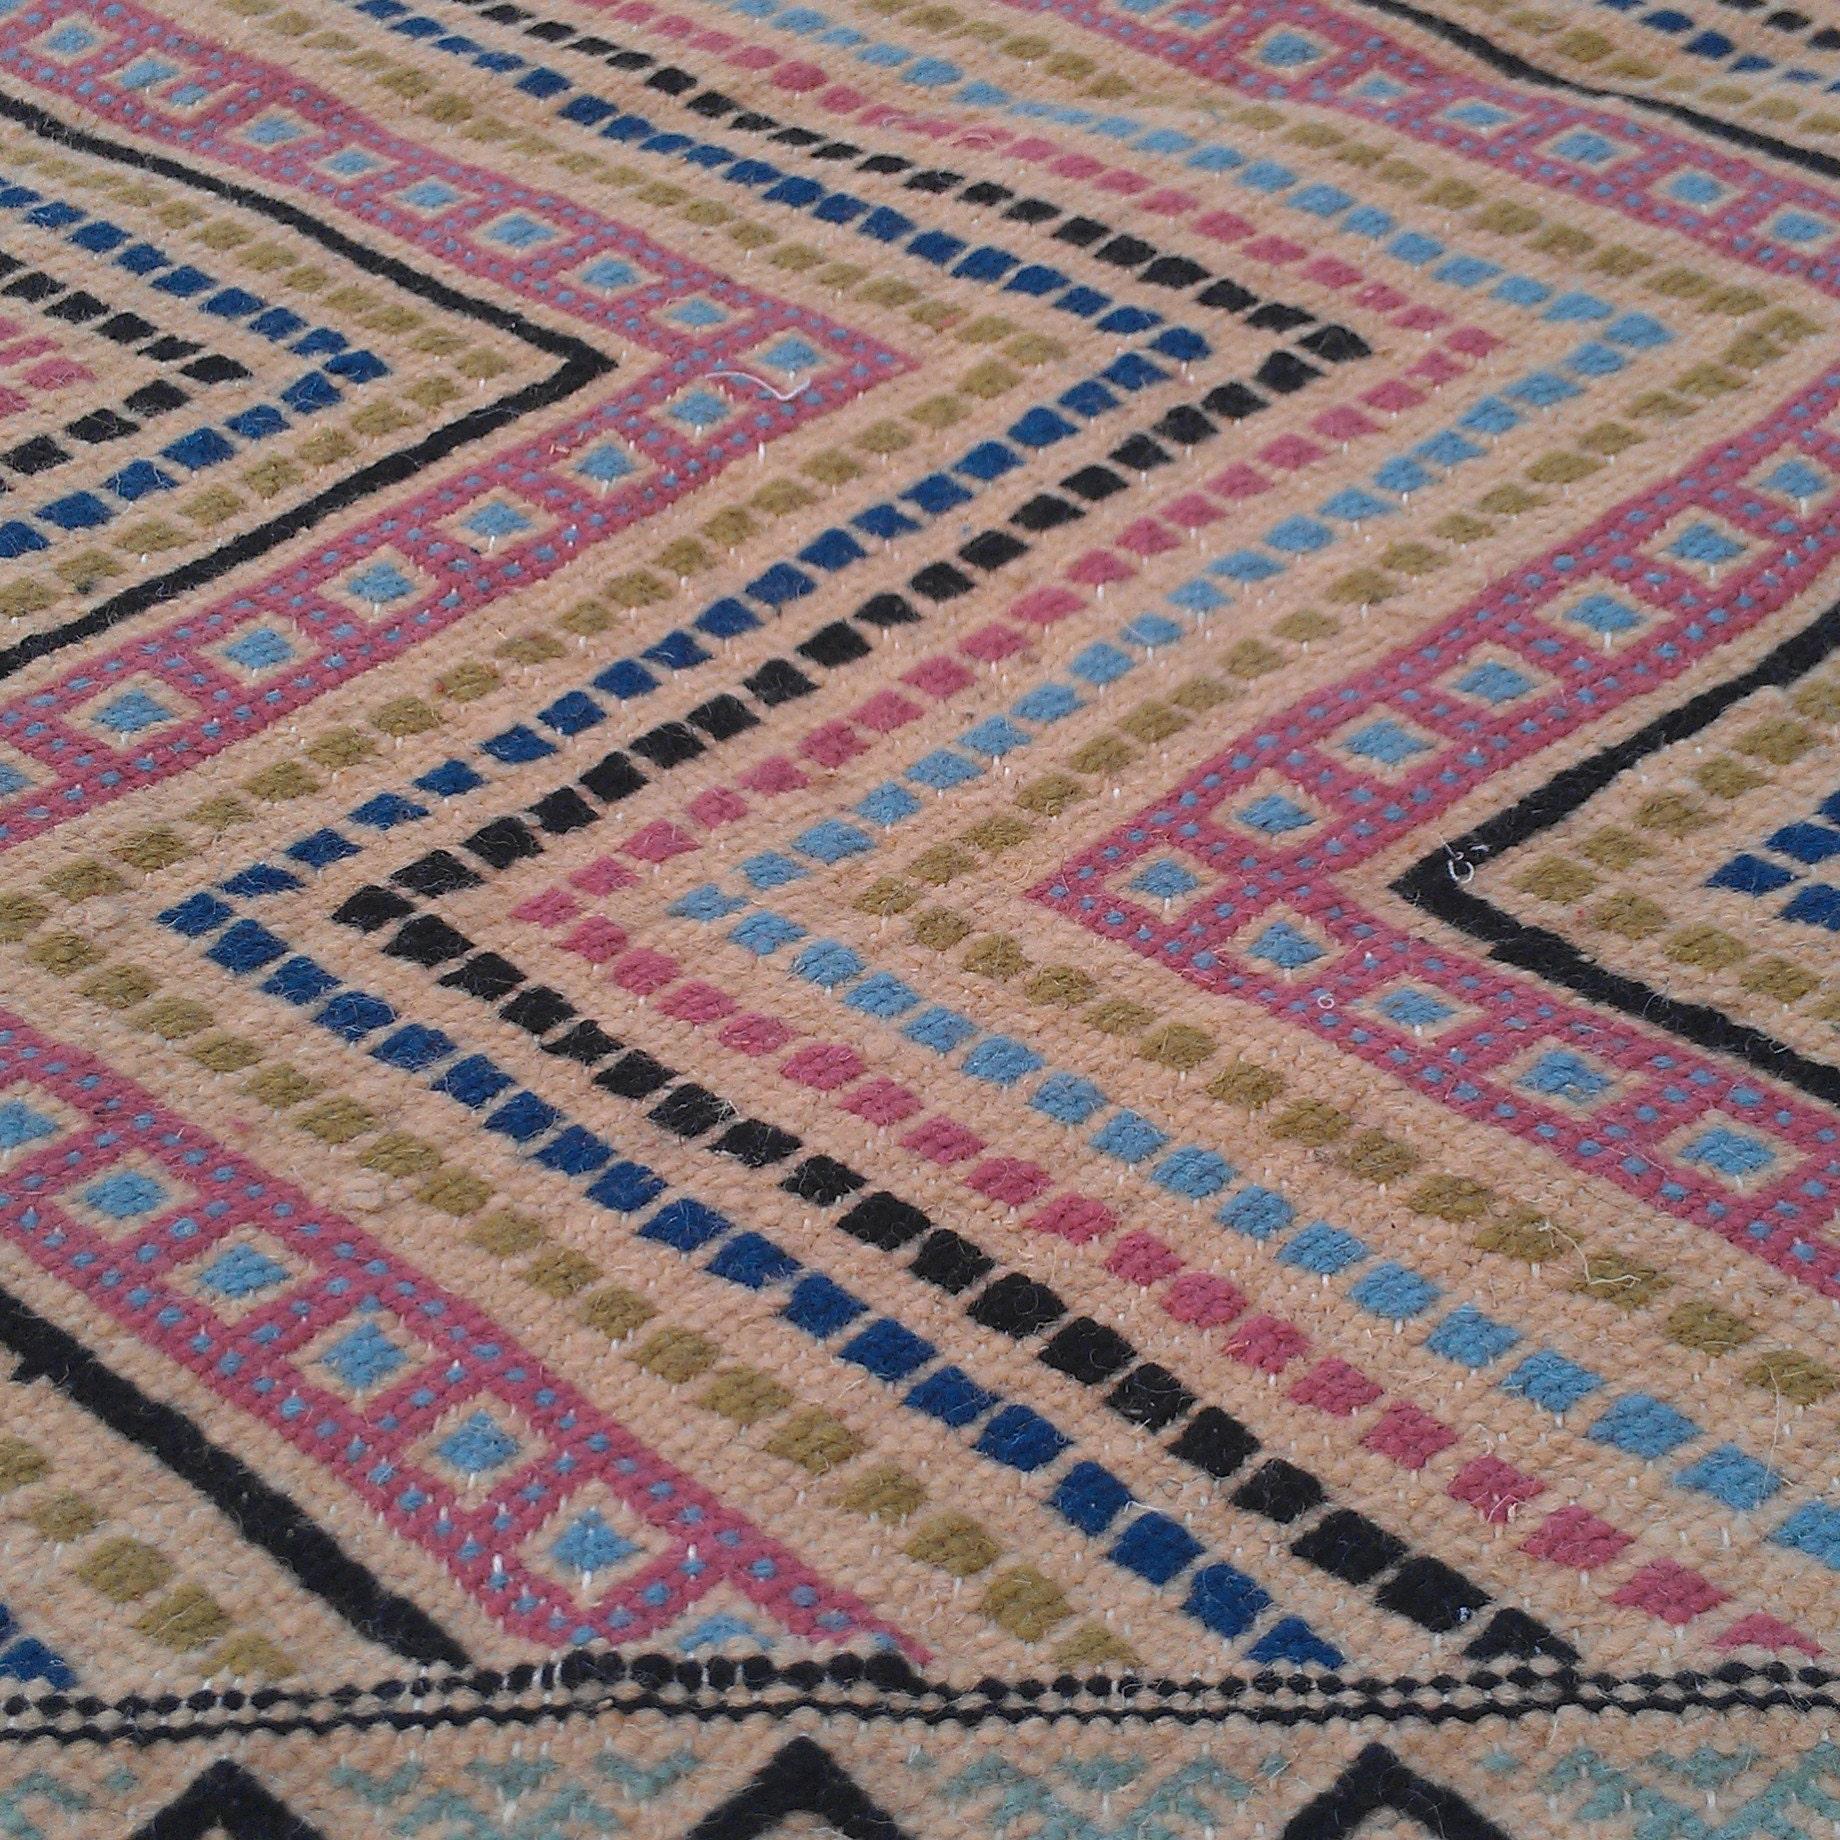 Kilim Rugs Area Rug Carpet Large Kilim Rug Berber By RUGSstore